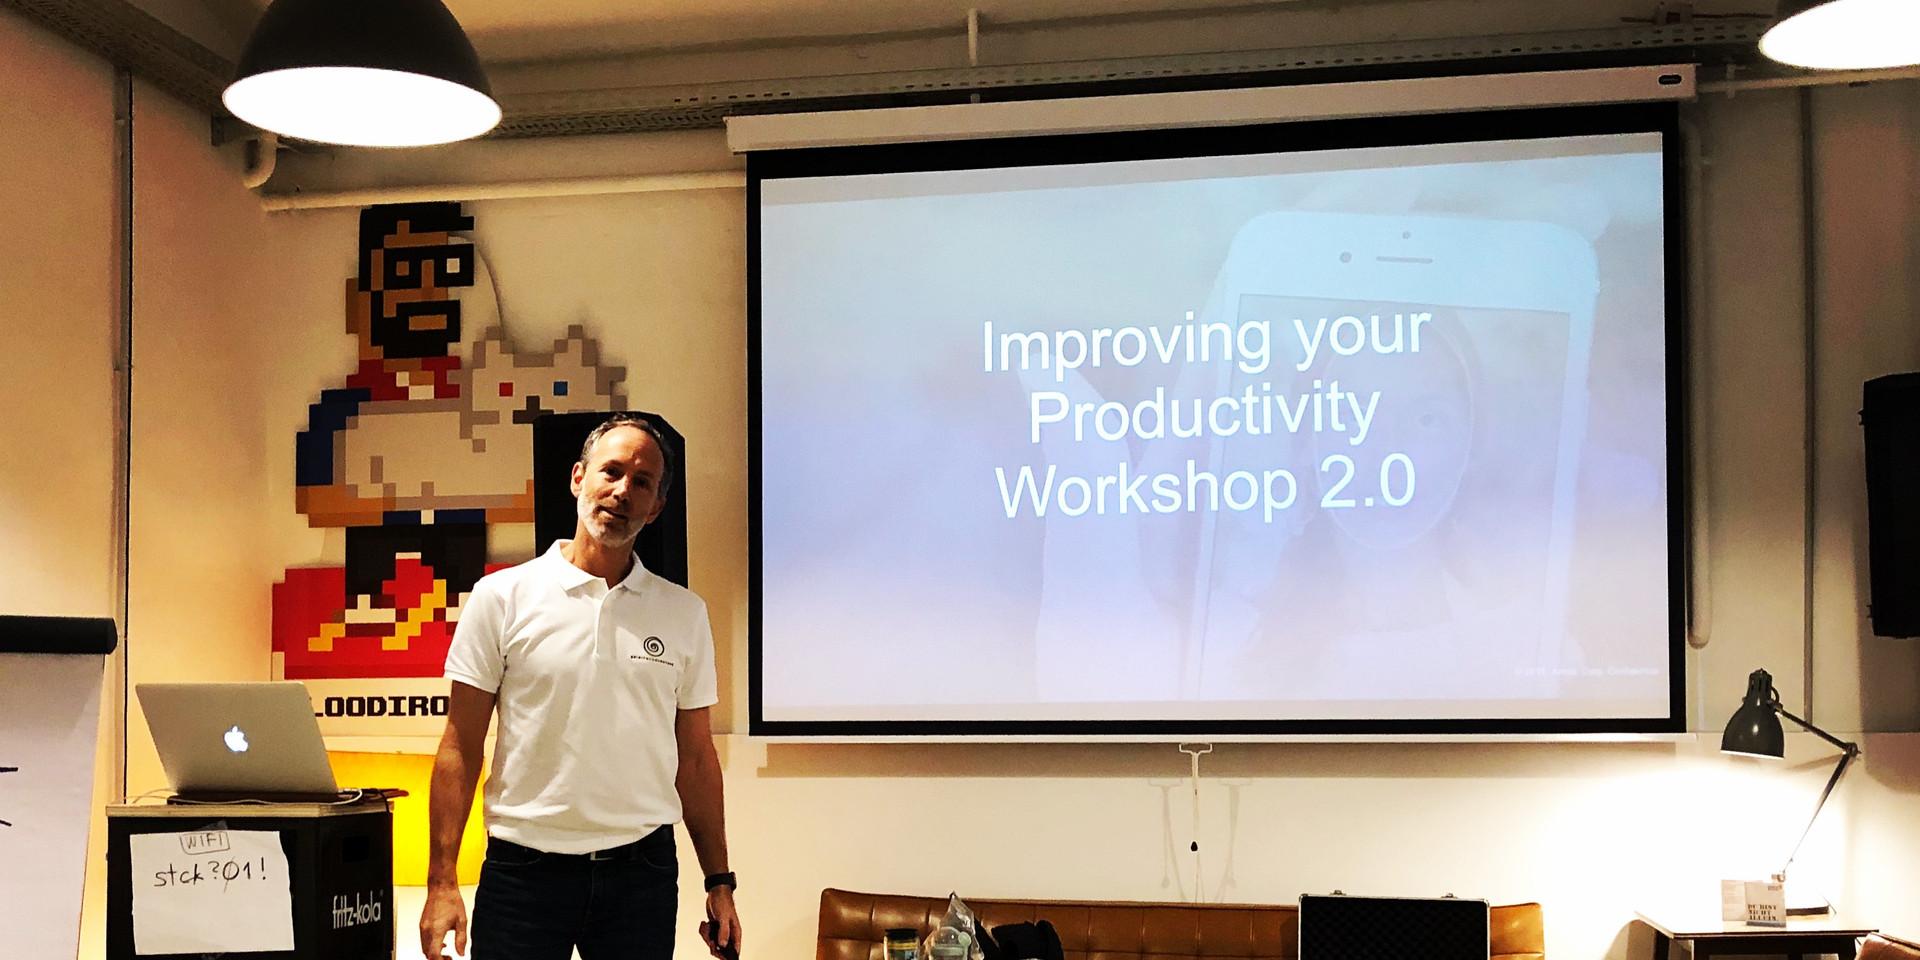 Team Productivity Workshop